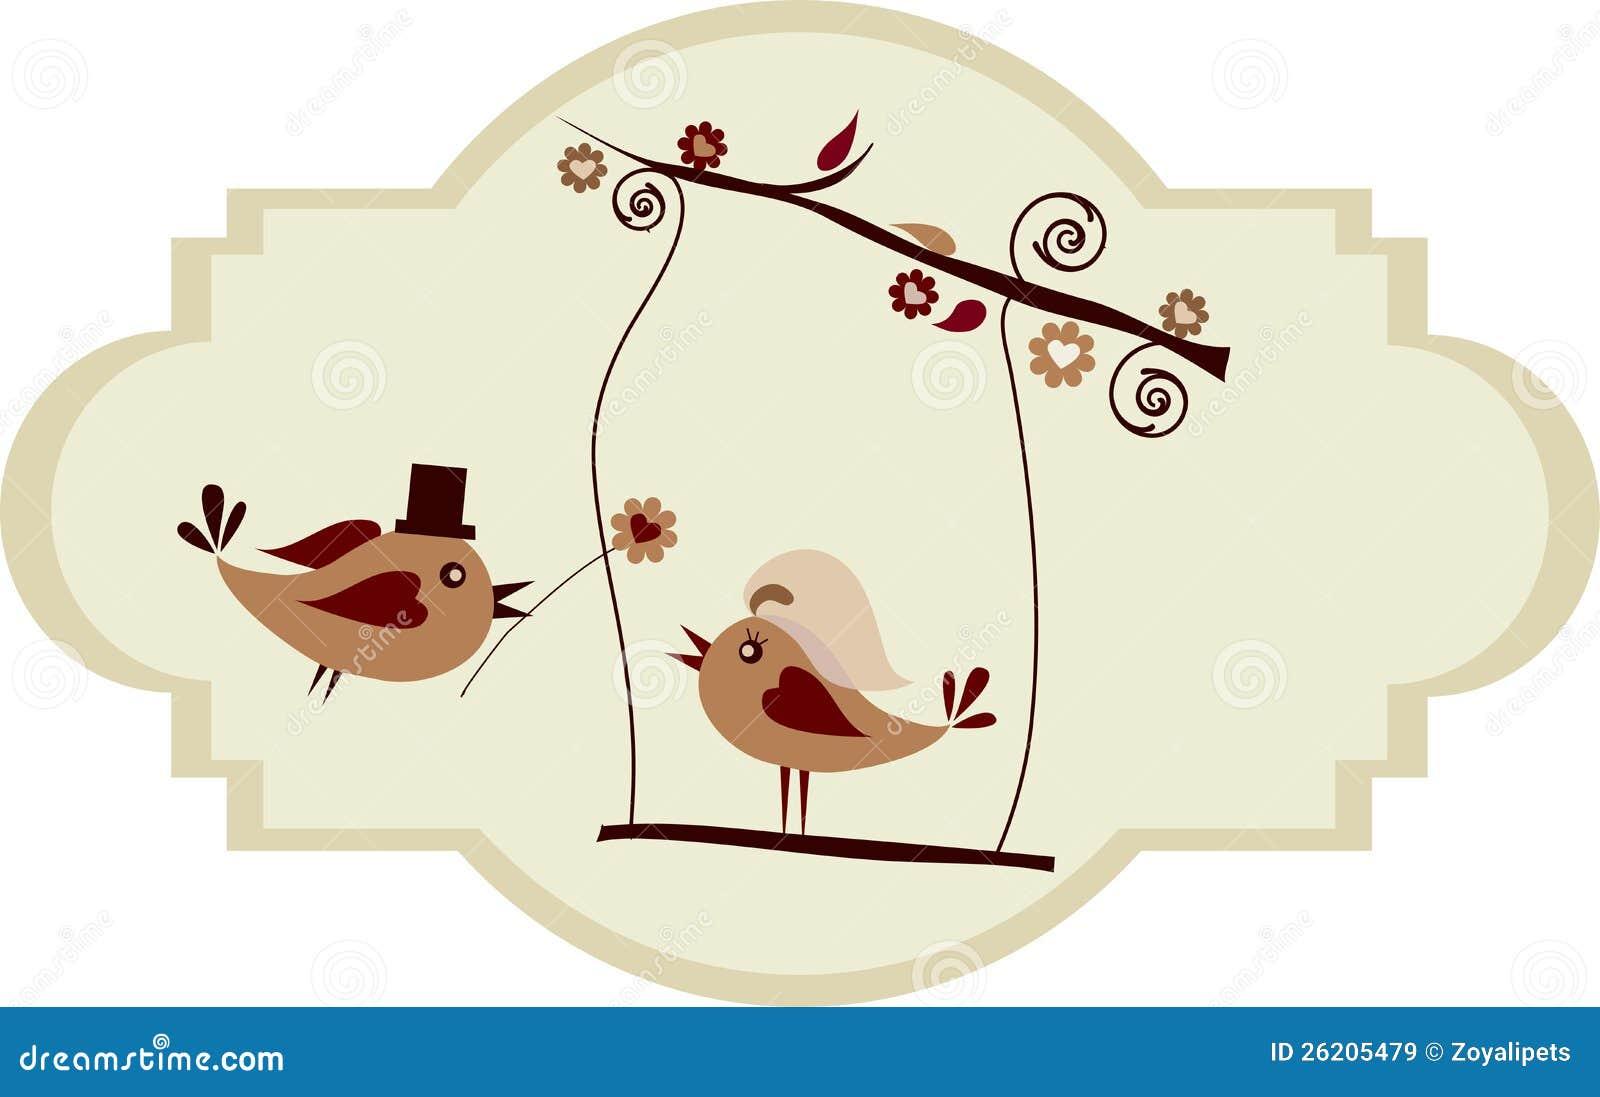 Wedding Card; Groom Bird Giving A Flower Royalty Free ...